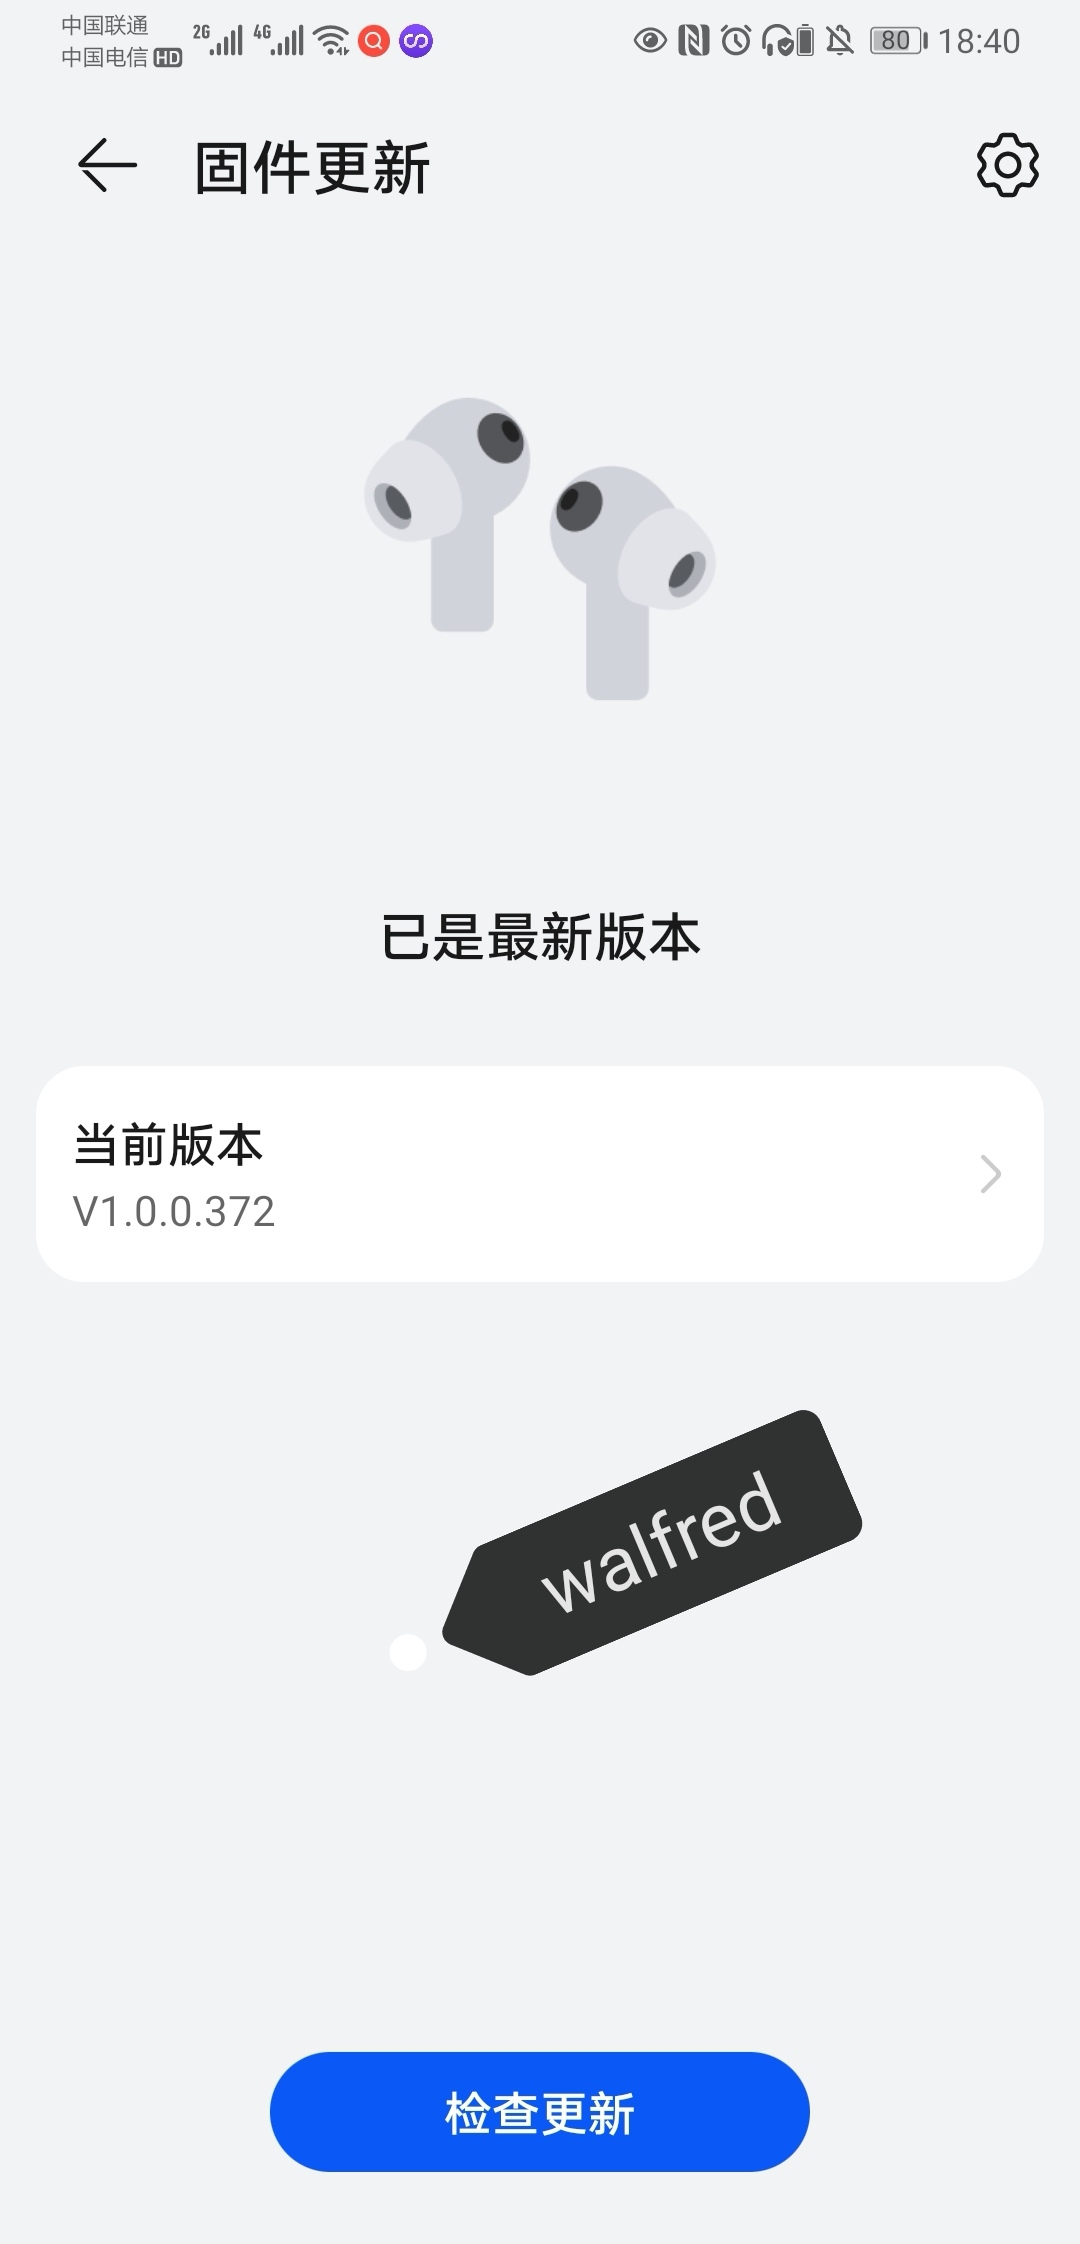 Screenshot_20210520_184058_com.huawei.smarthome_edit_191040129809910.jpg